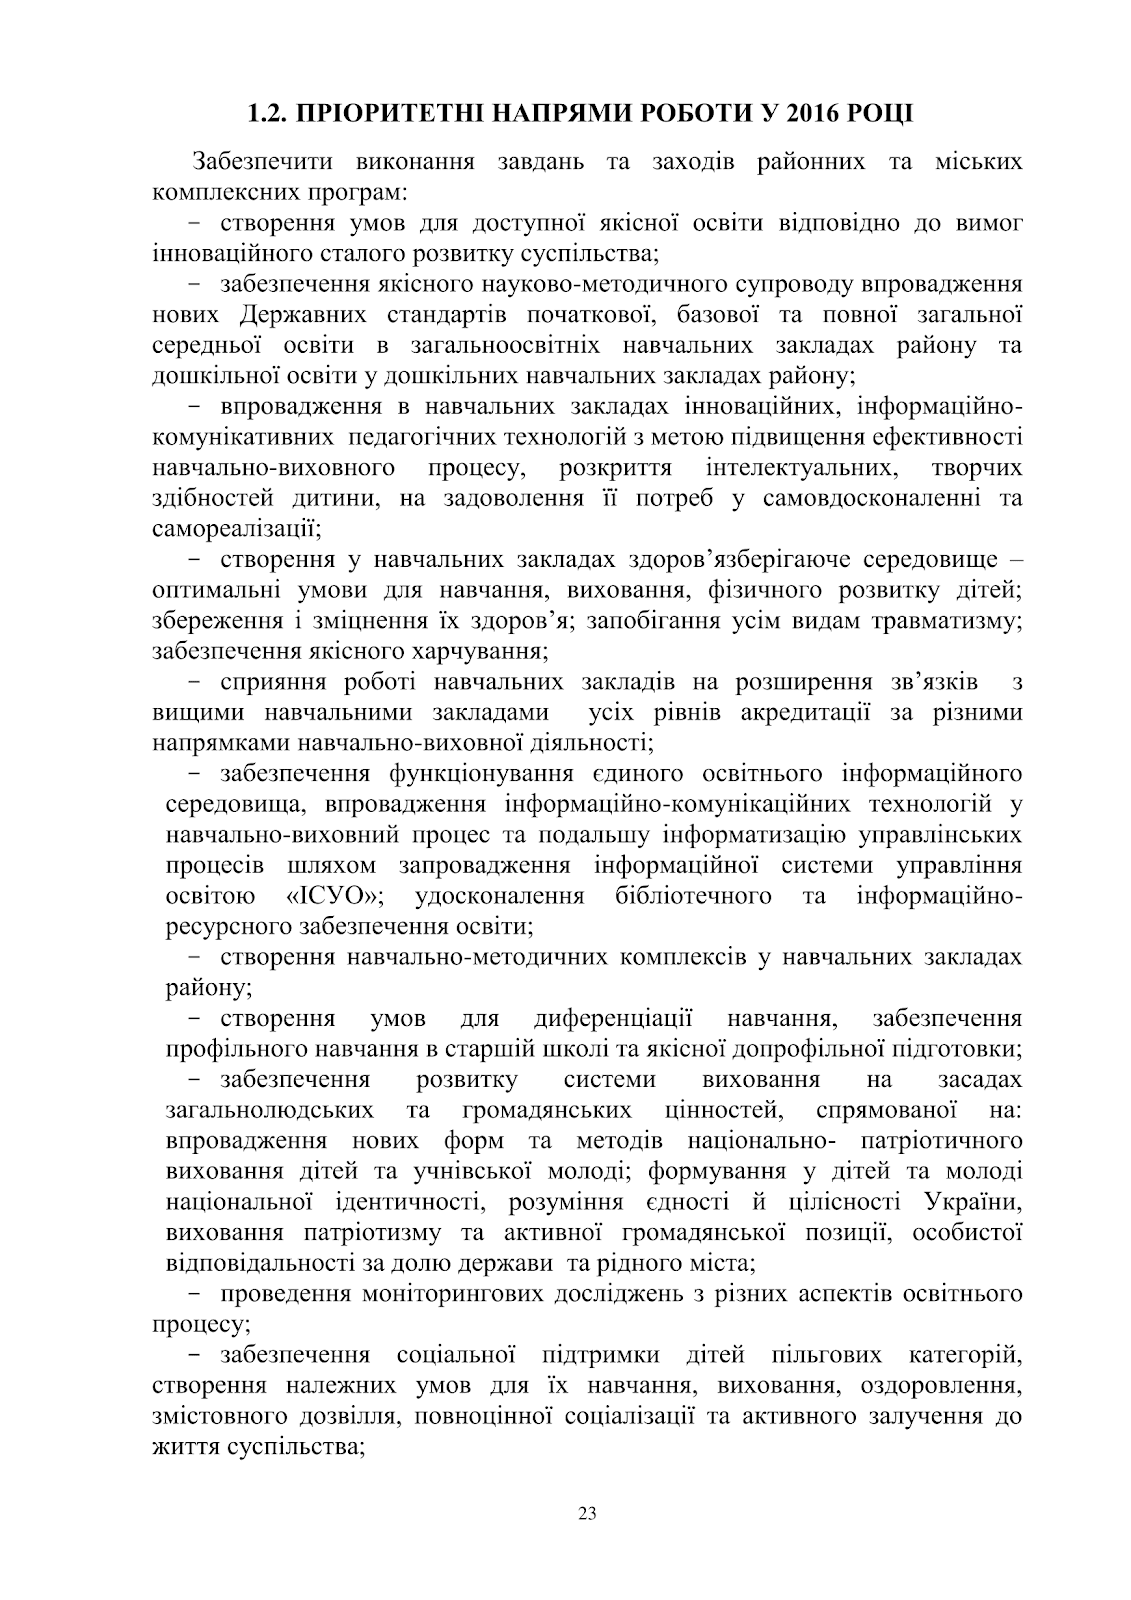 C:\Users\Валерия\Desktop\план 2016 рік\план 2016 рік-023.png